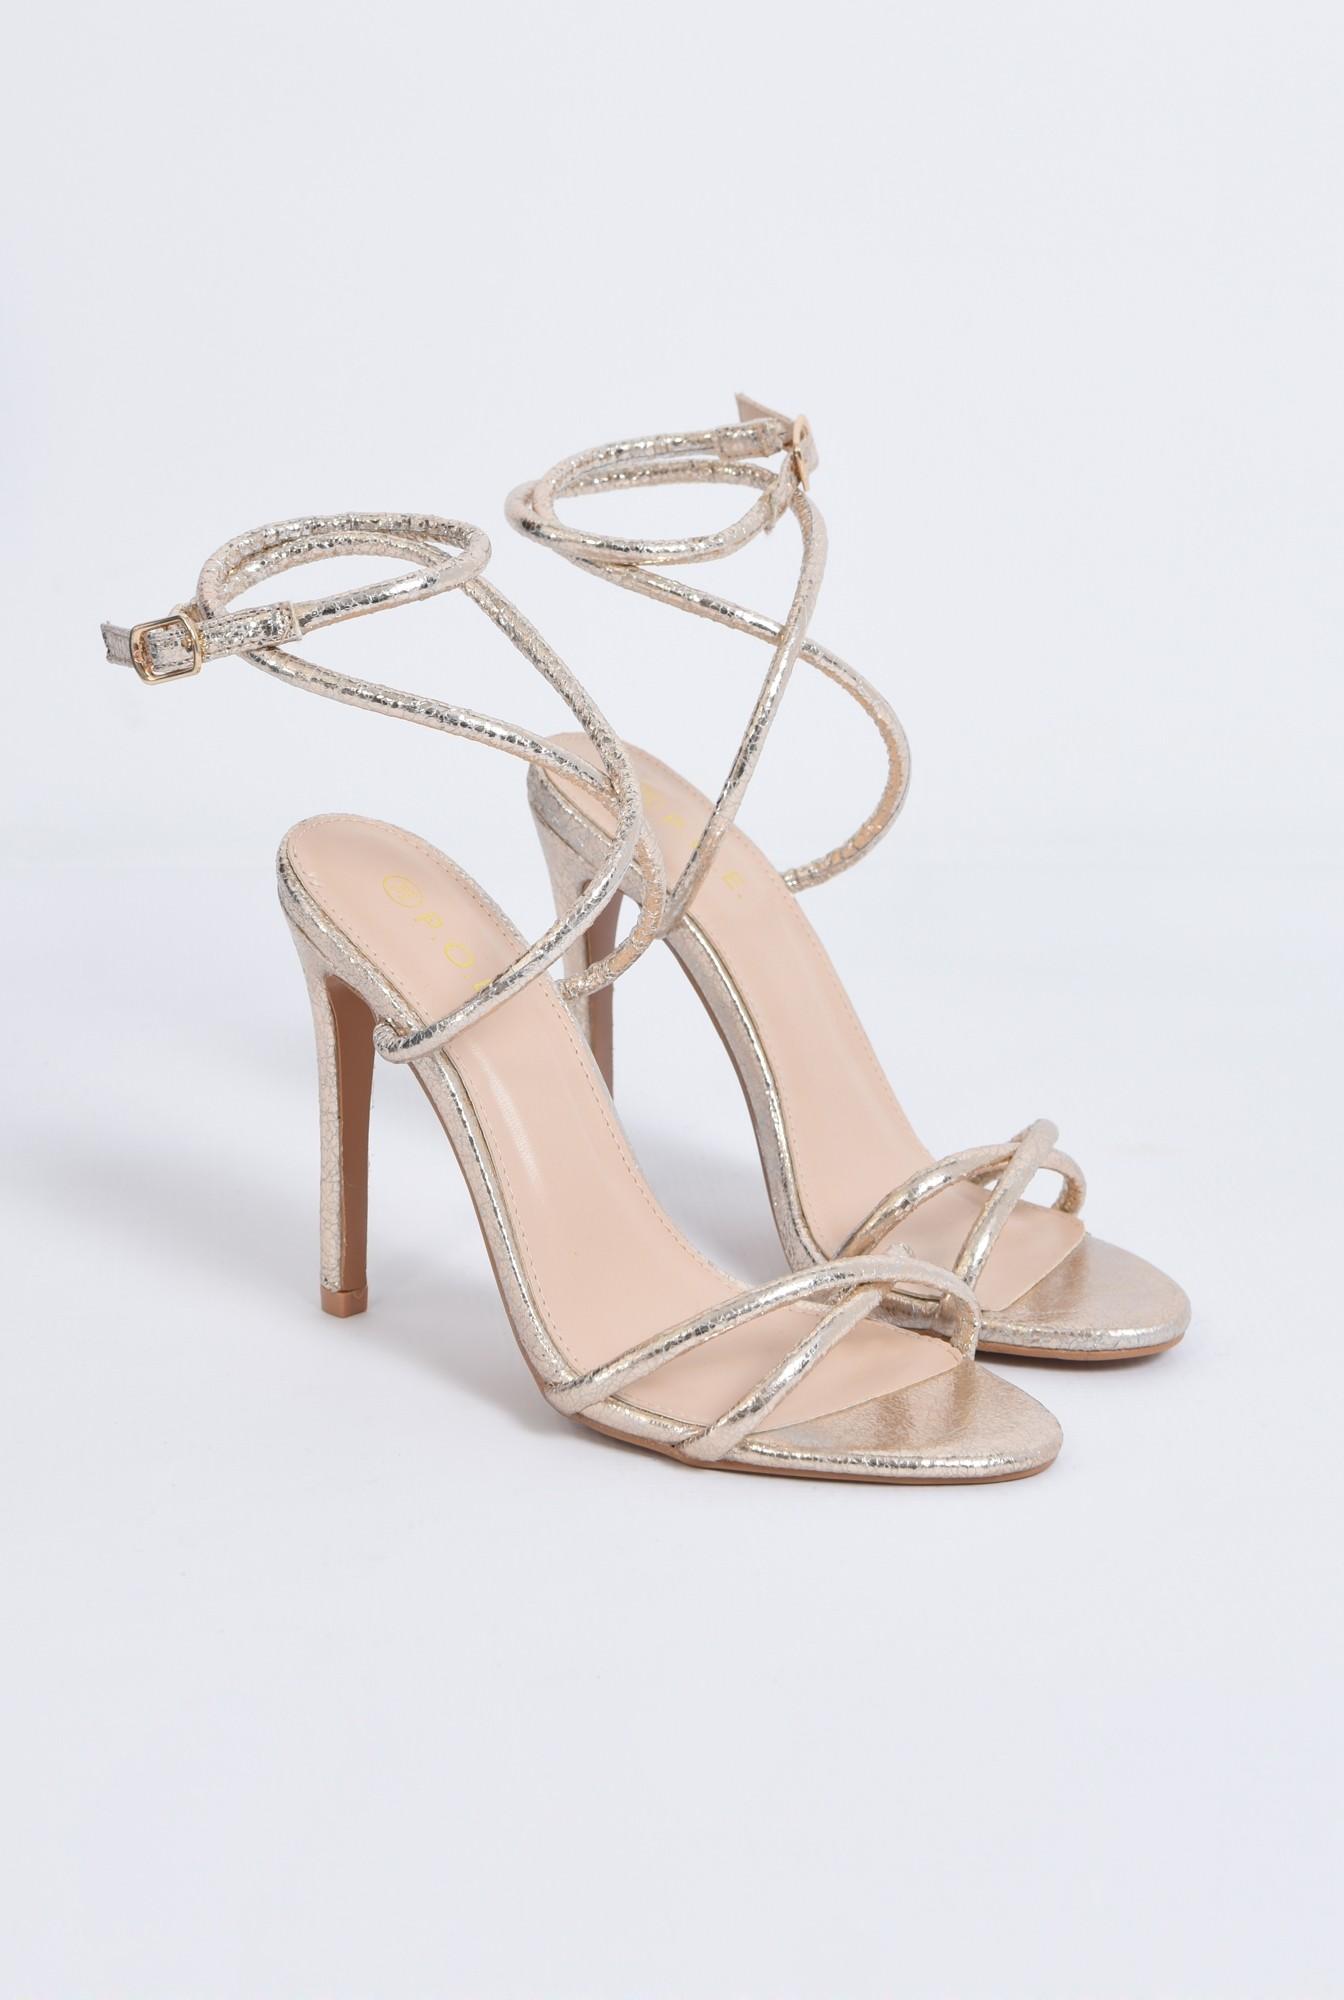 2 - sandale de ocazie, barete subtiri, toc inalt